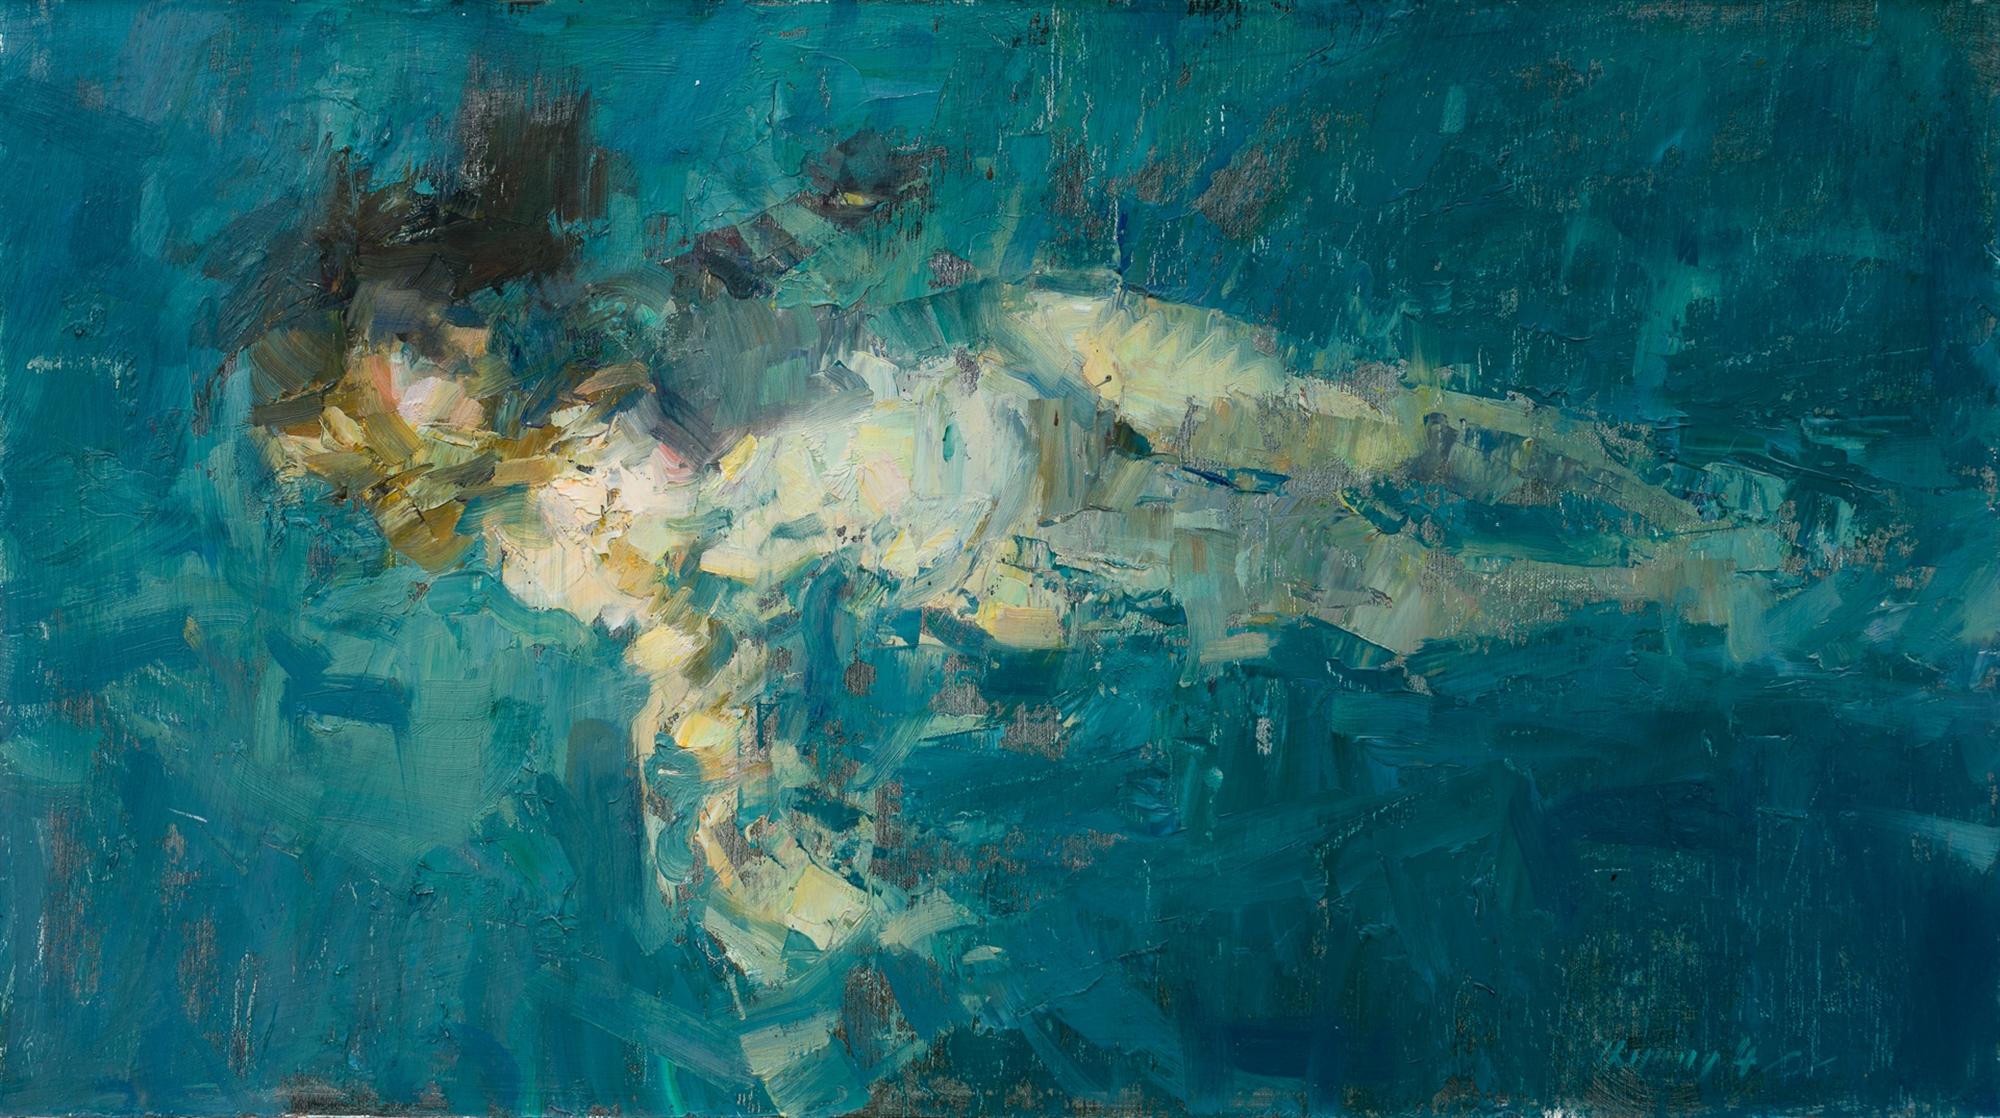 Mermaid by Quang Ho